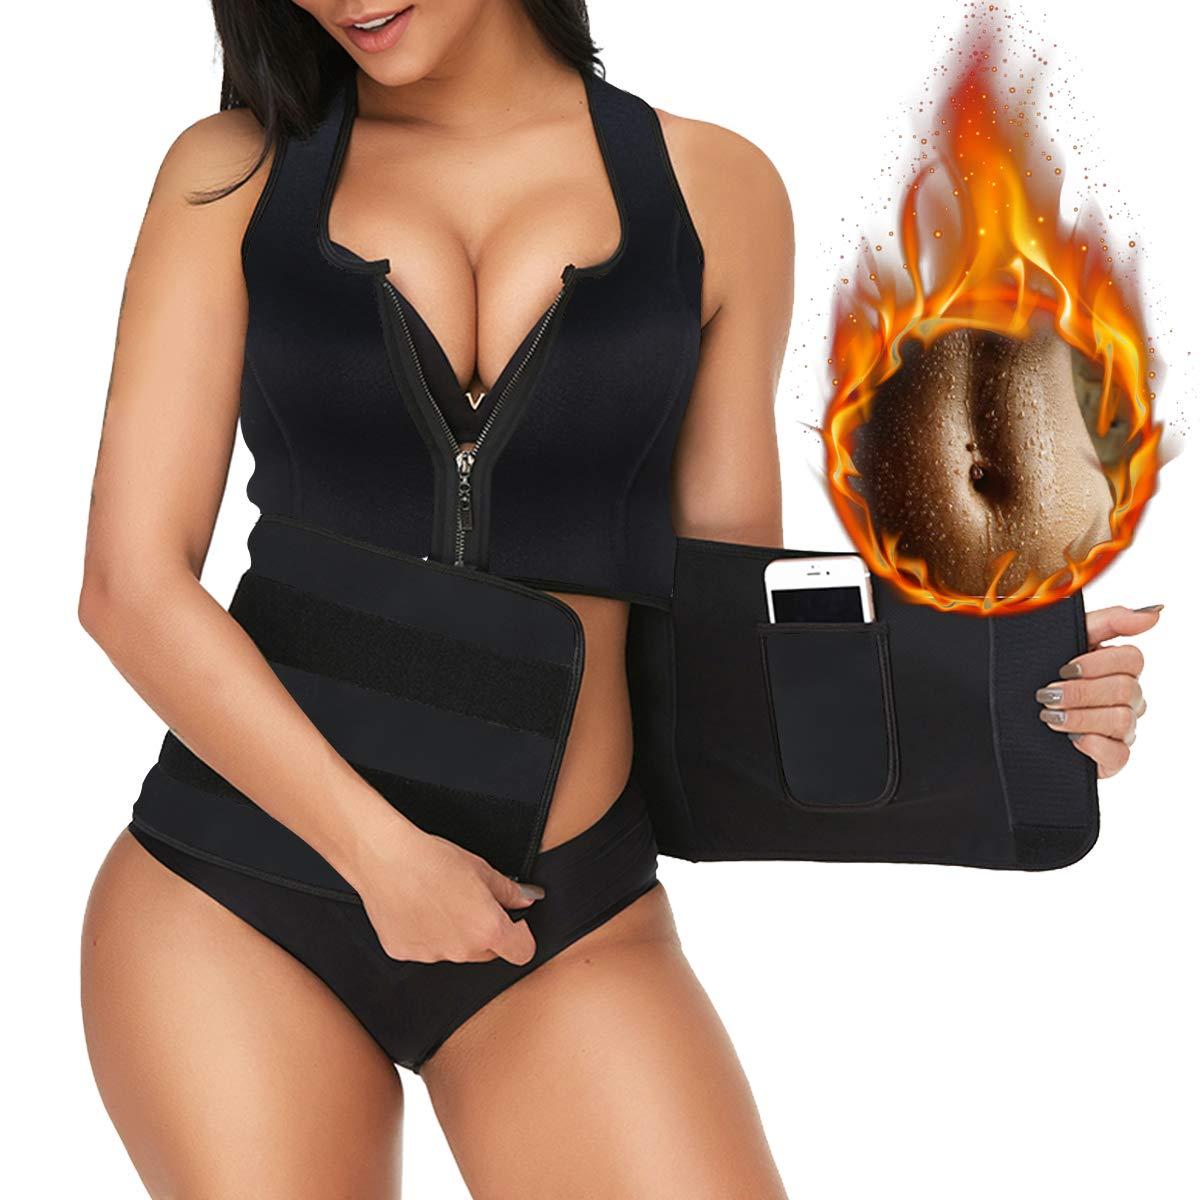 1black Neoprene Sauna Suit Tank Top Vest for Women, Slimerence, Latex Sport Girdle Waist Trainer Corset